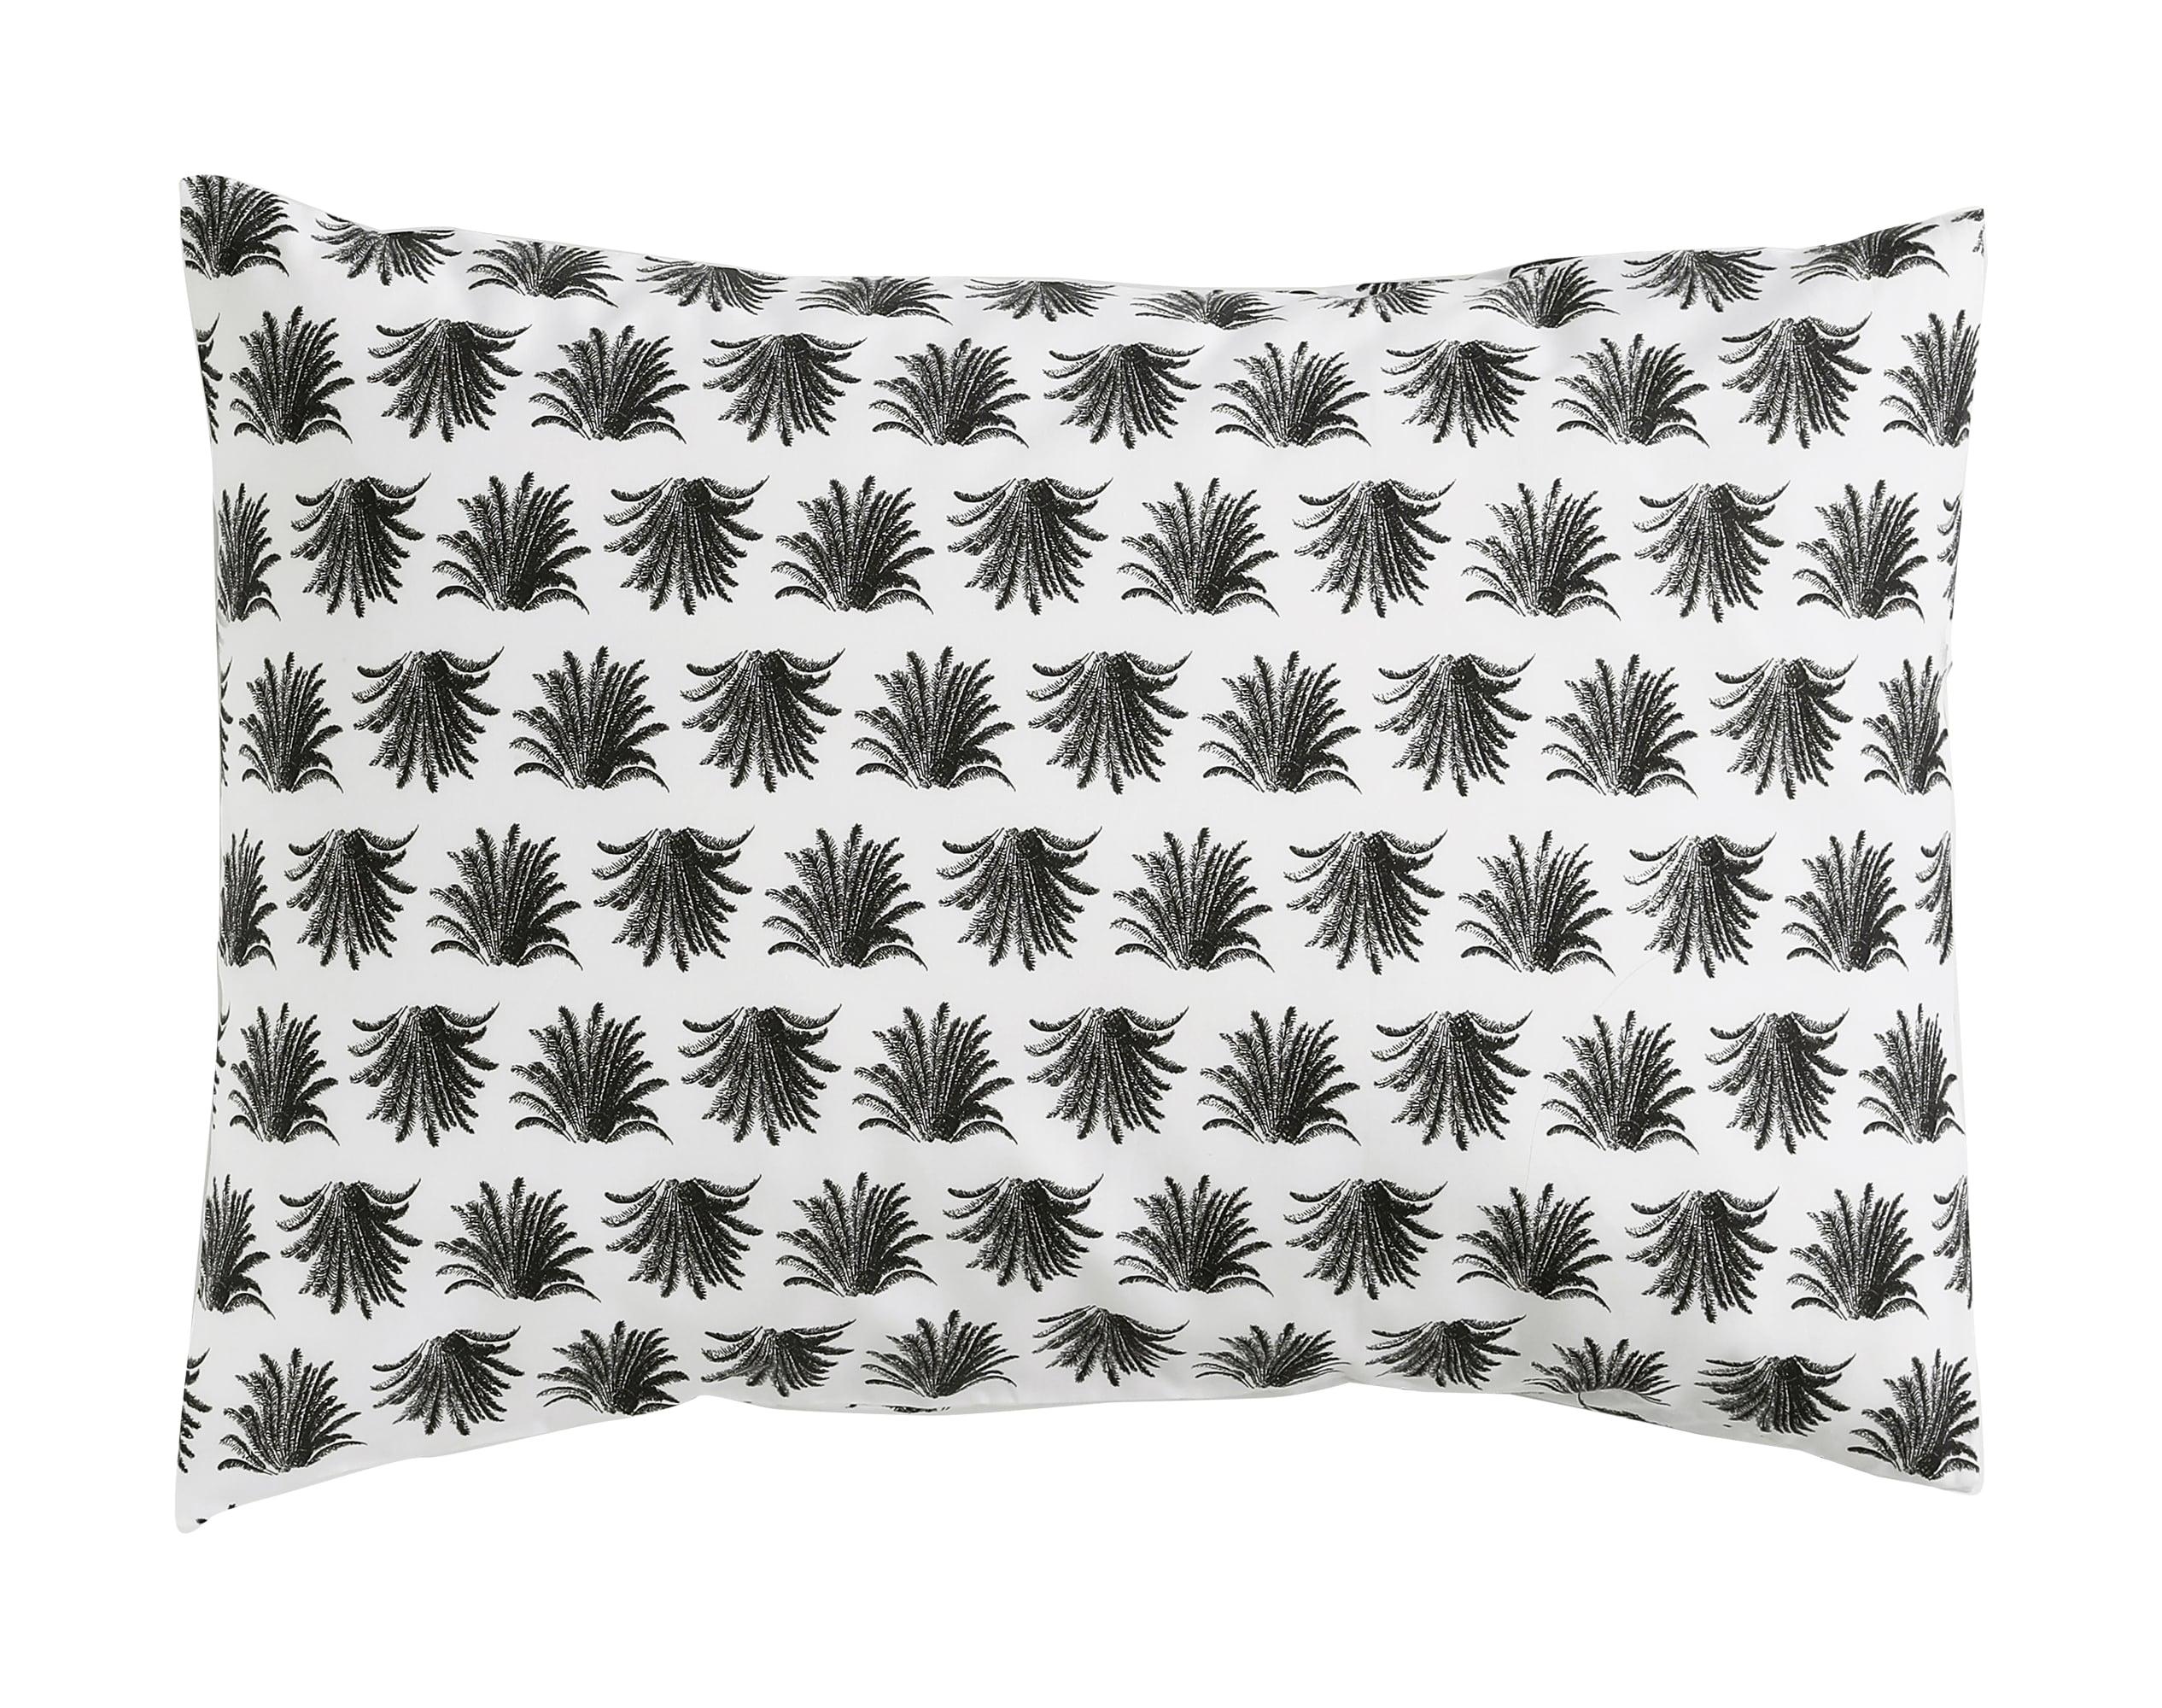 Taie d'oreiller 50x70 en coton gris anthracite